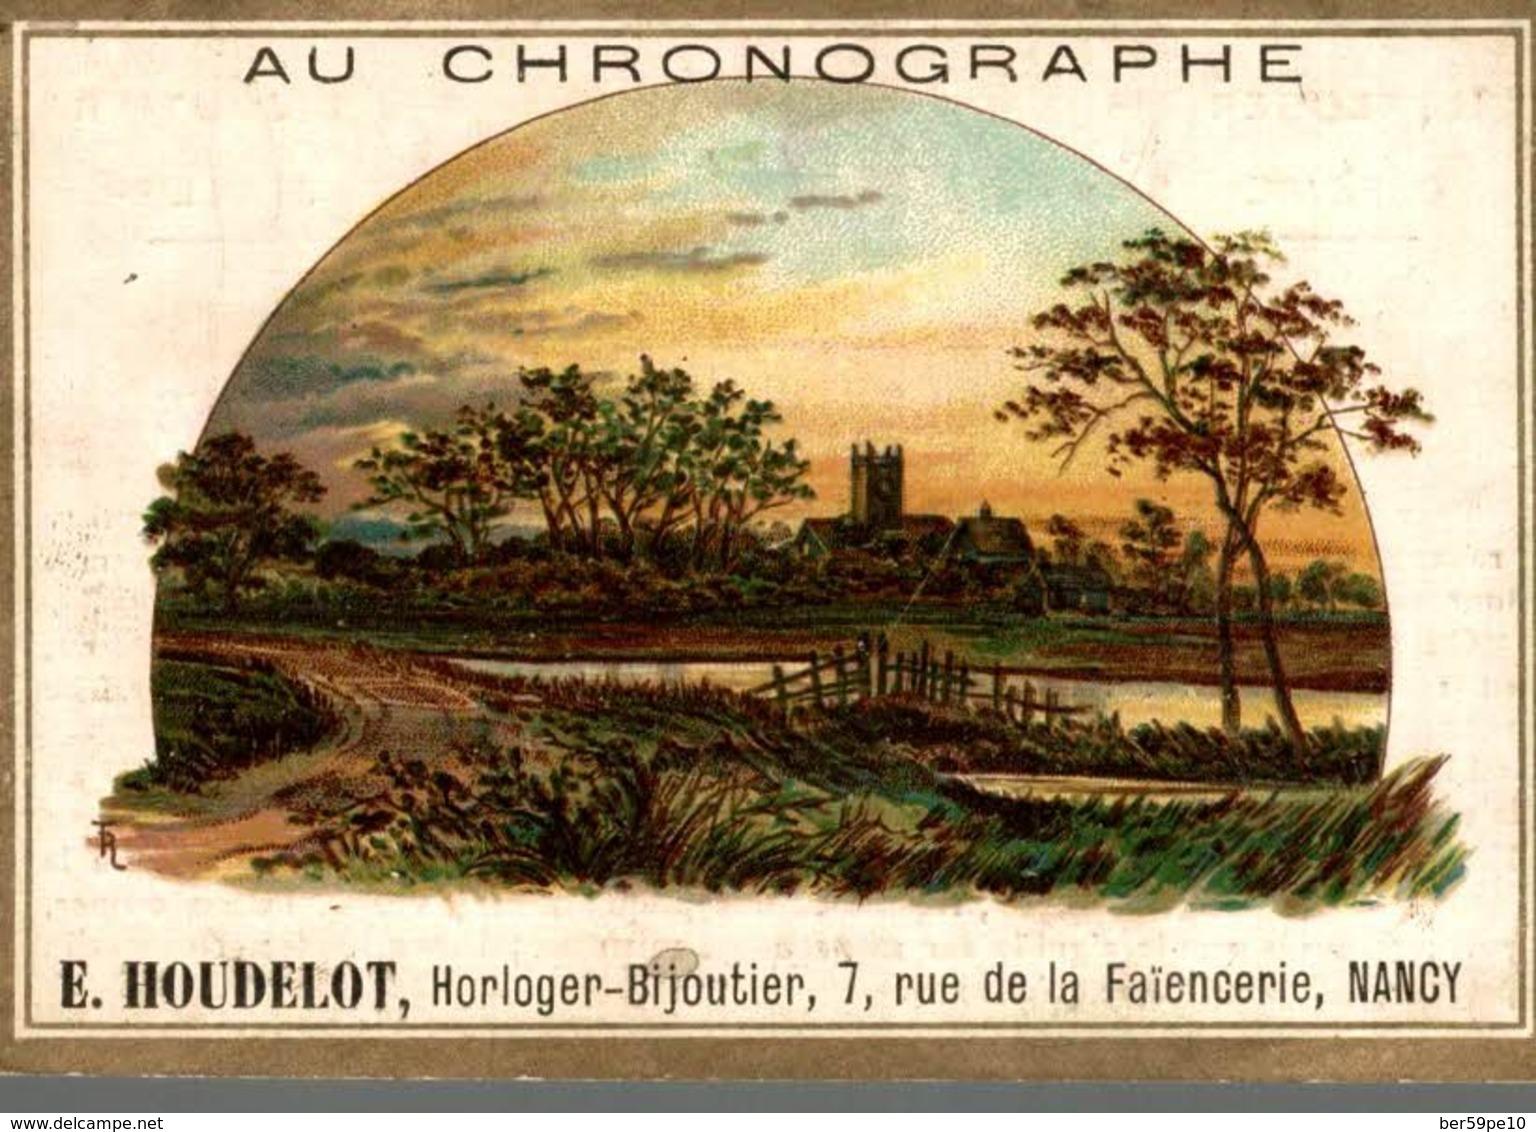 CHROMO  AU CHRONOGRAPHE E. HOUDELOT NANCY  LE CHATEAU A LA CAMPAGNE - Chromos